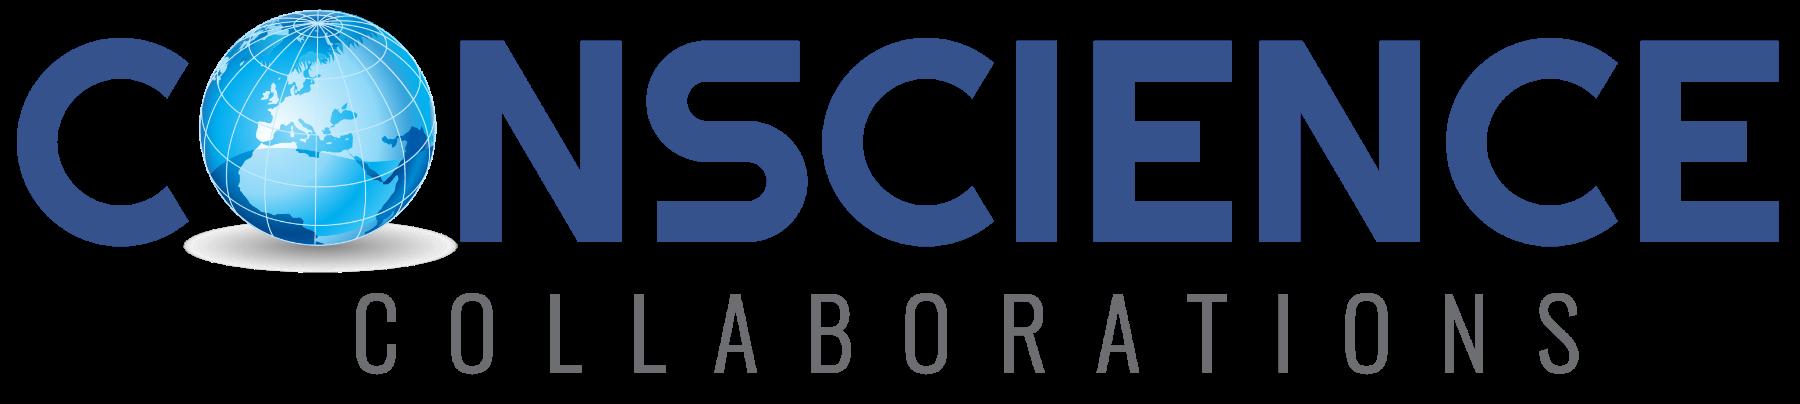 Conscience Collaborations Logo